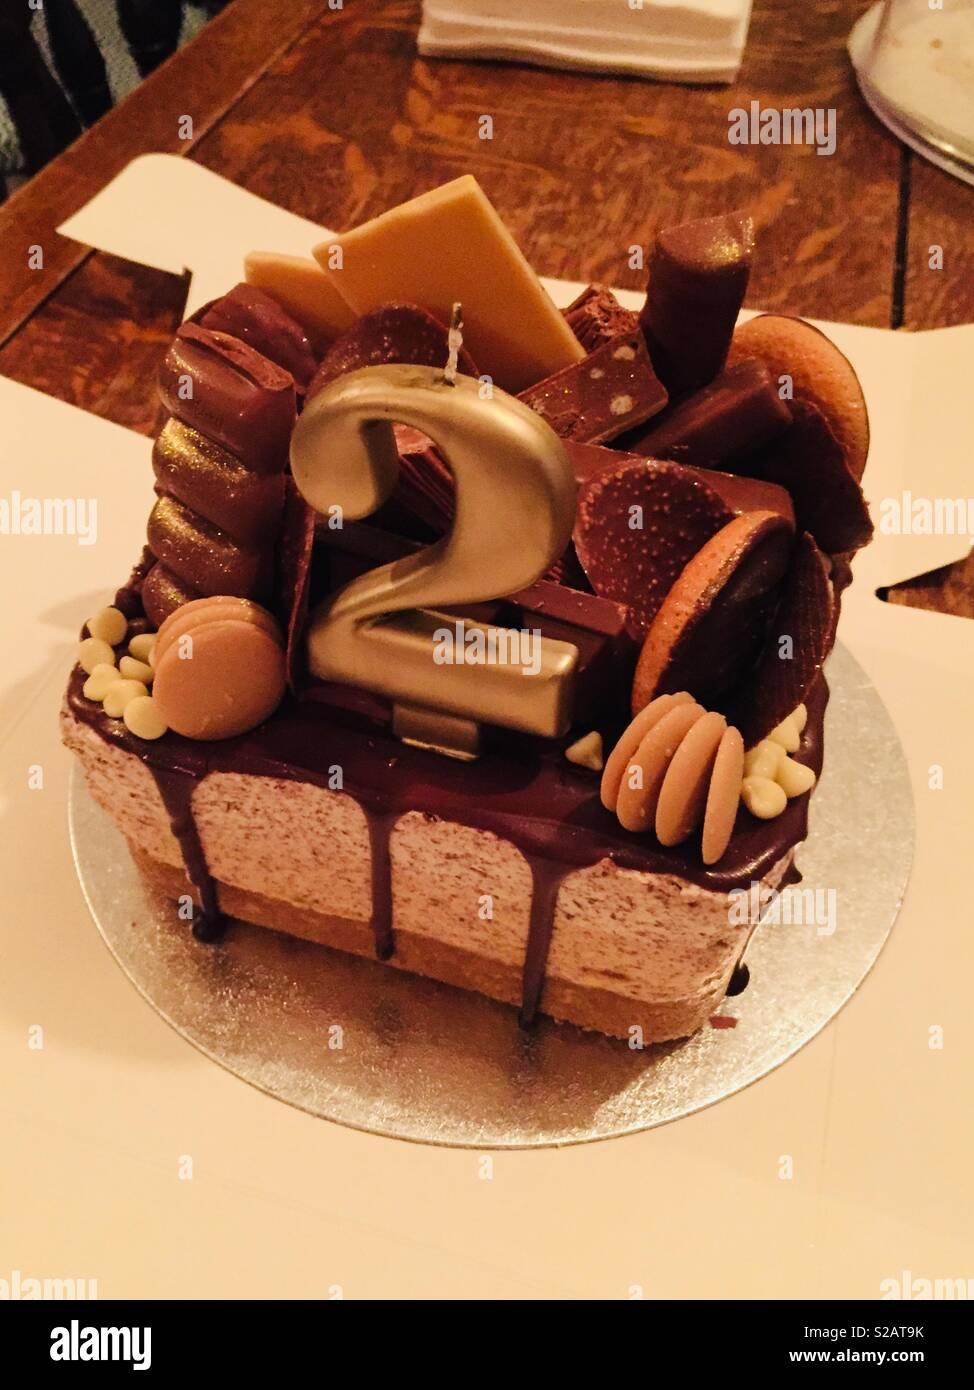 Swell 2Nd Birthday Cake Stock Photo 311254543 Alamy Funny Birthday Cards Online Elaedamsfinfo